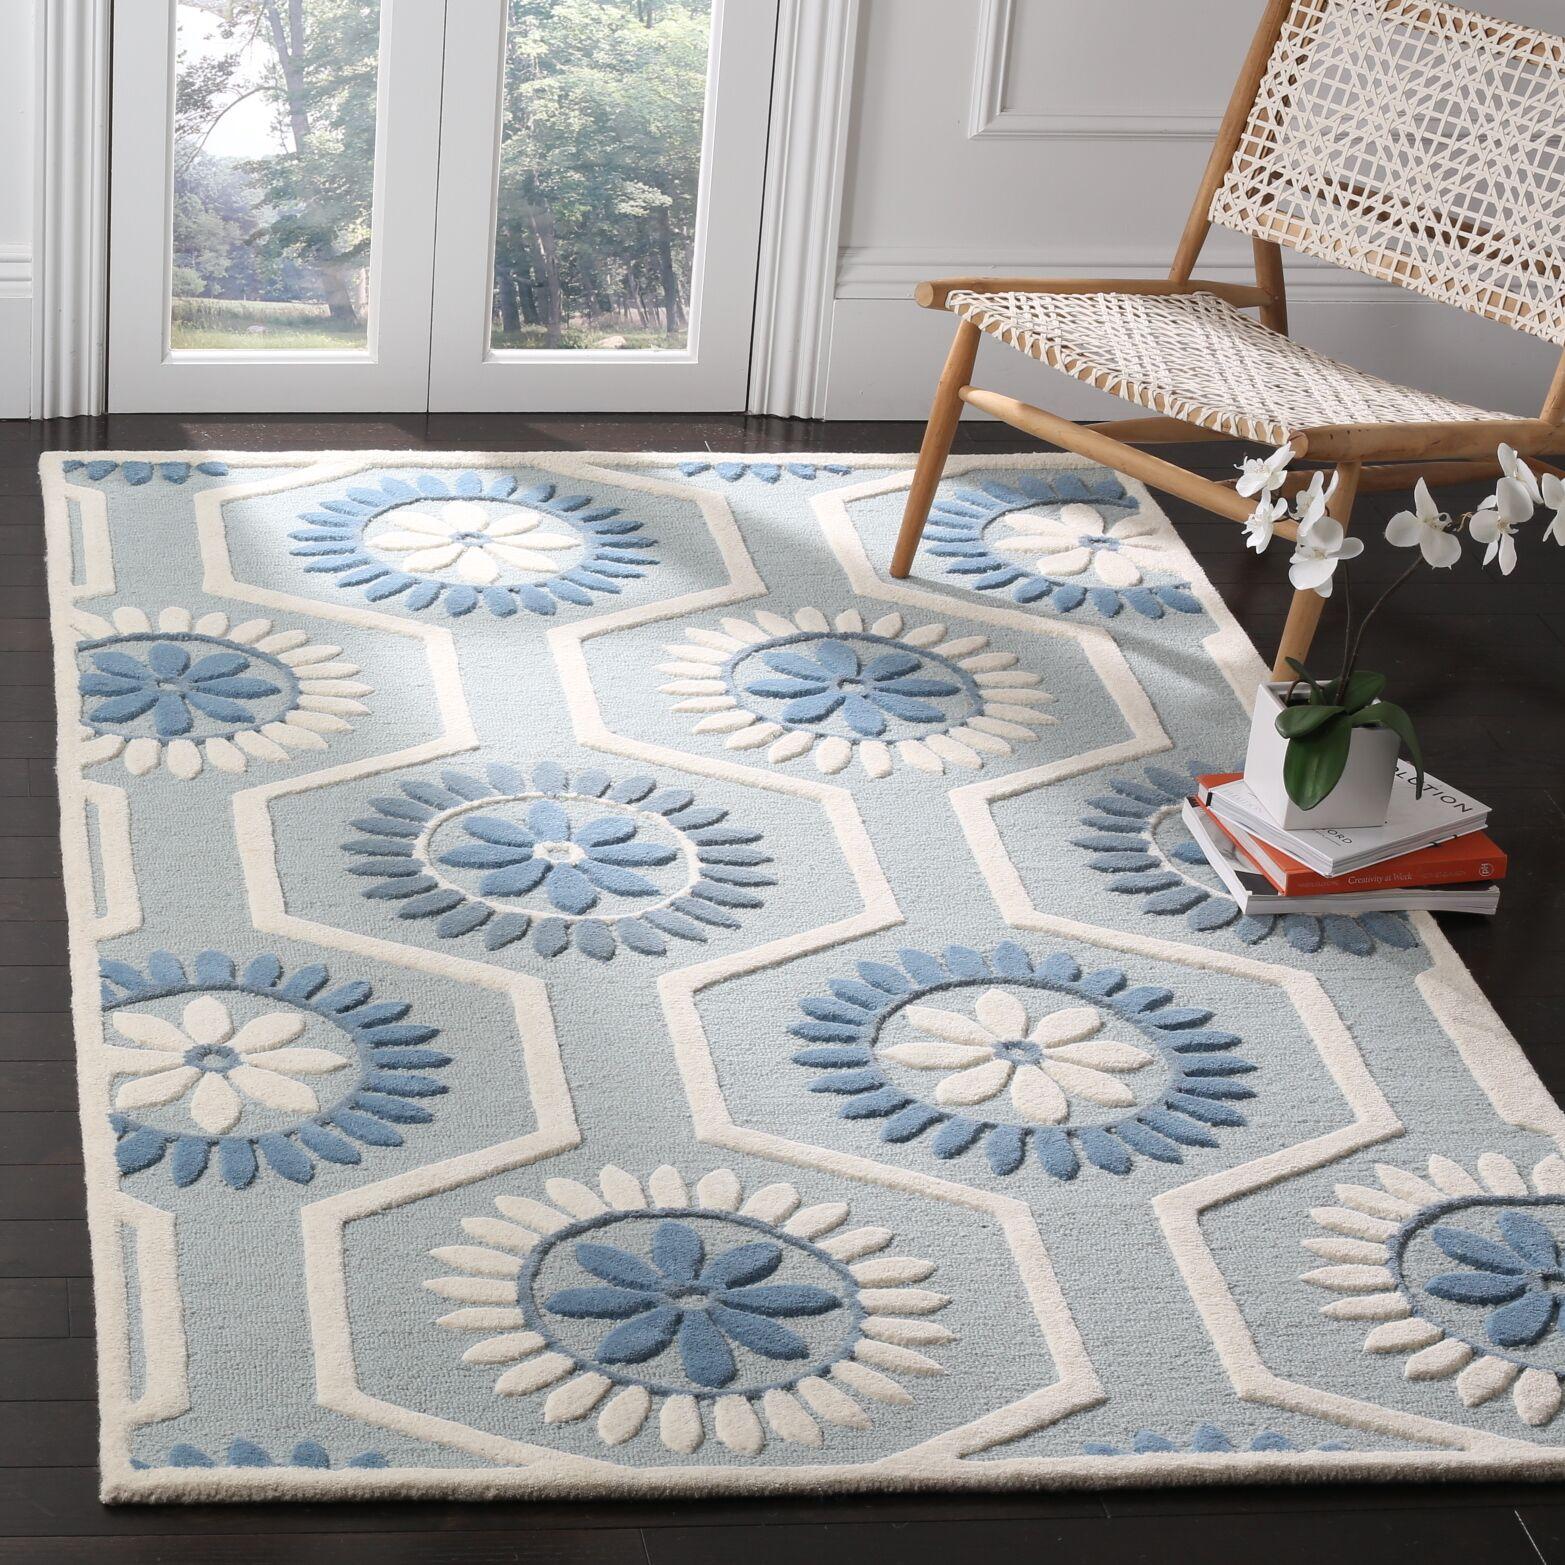 Martins Hand-Tufted Blue/Ivory Area Rug Rug Size: Rectangle 4' x 6'